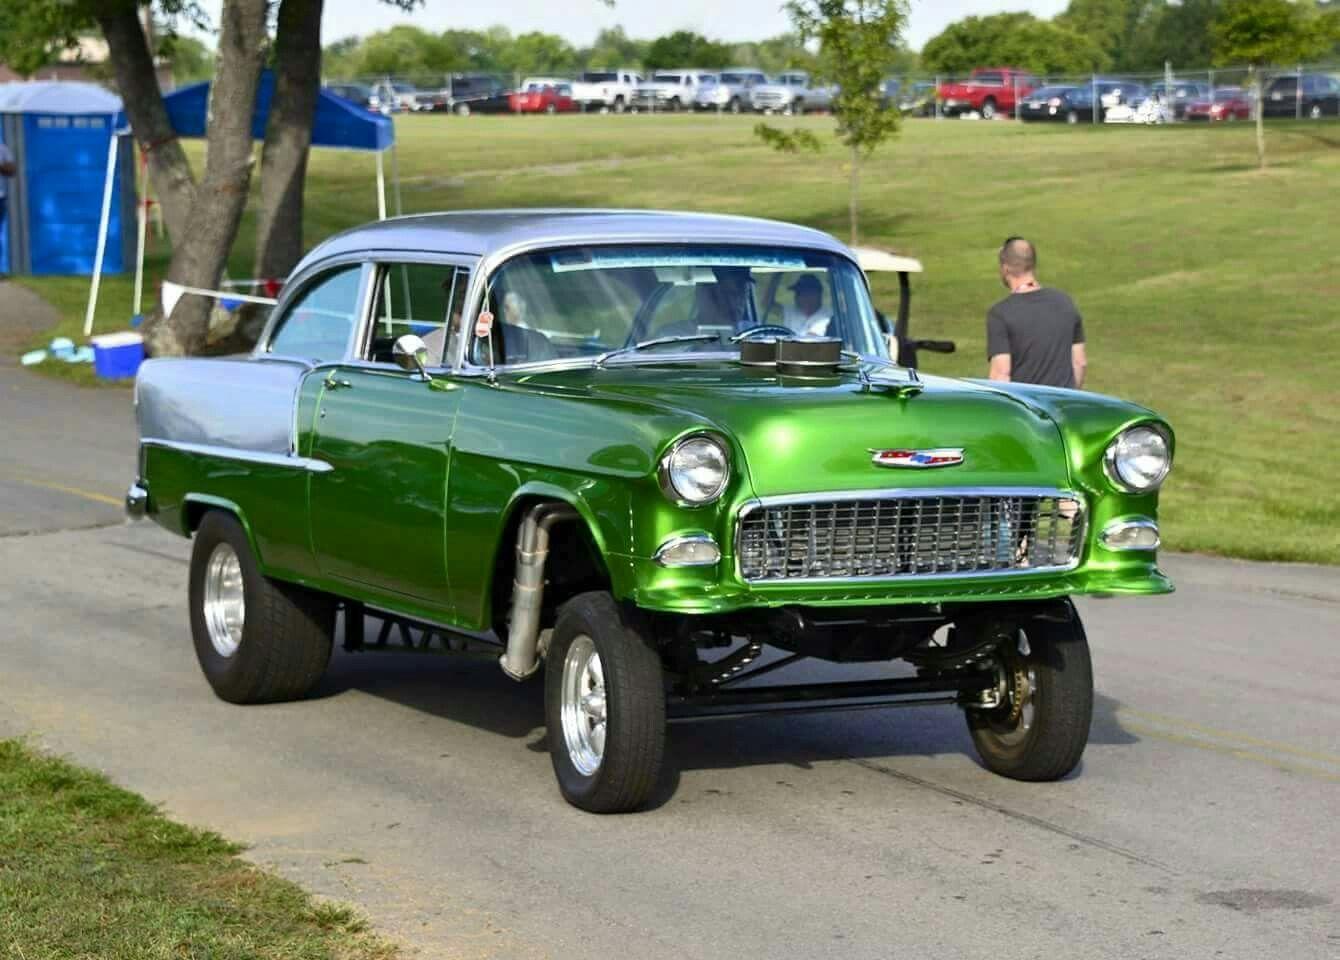 1956 ford customline wagon old car hunt - Straight Axle Nova Cars I Love Pinterest Cars Chevrolet And Muscles